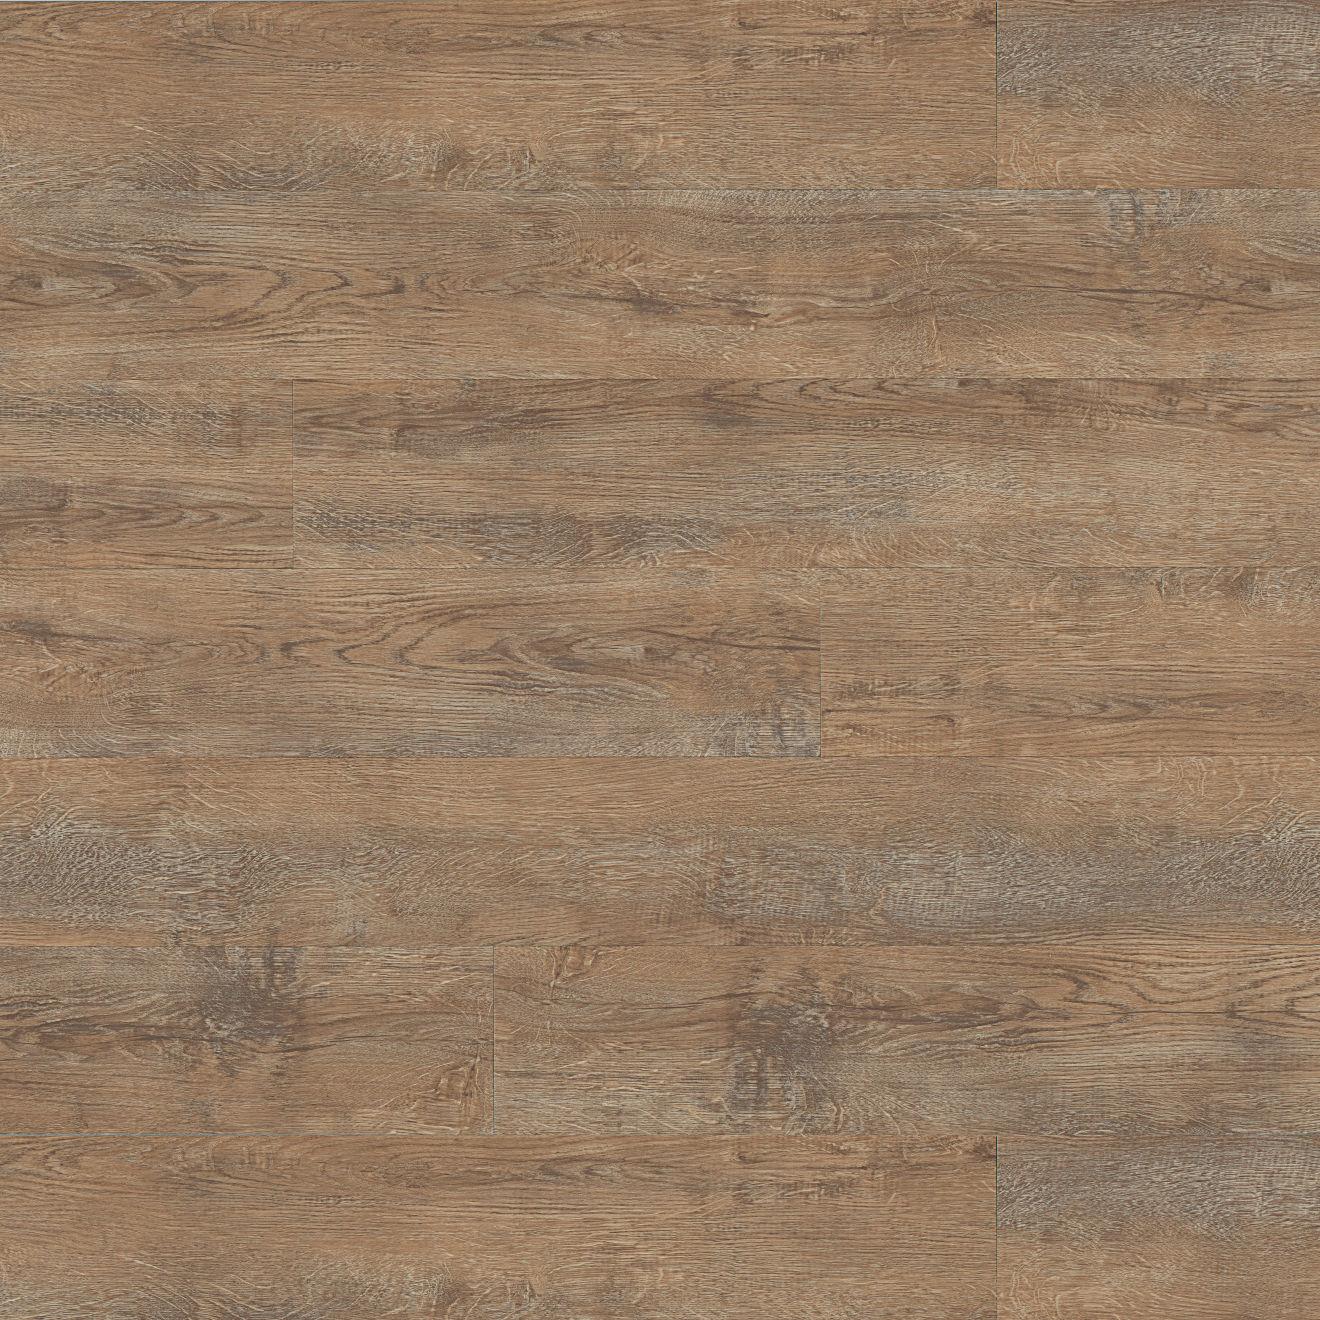 "Madera 7"" x 48"" Luxury SPC Vinyl Flooring in Tawney Oak"